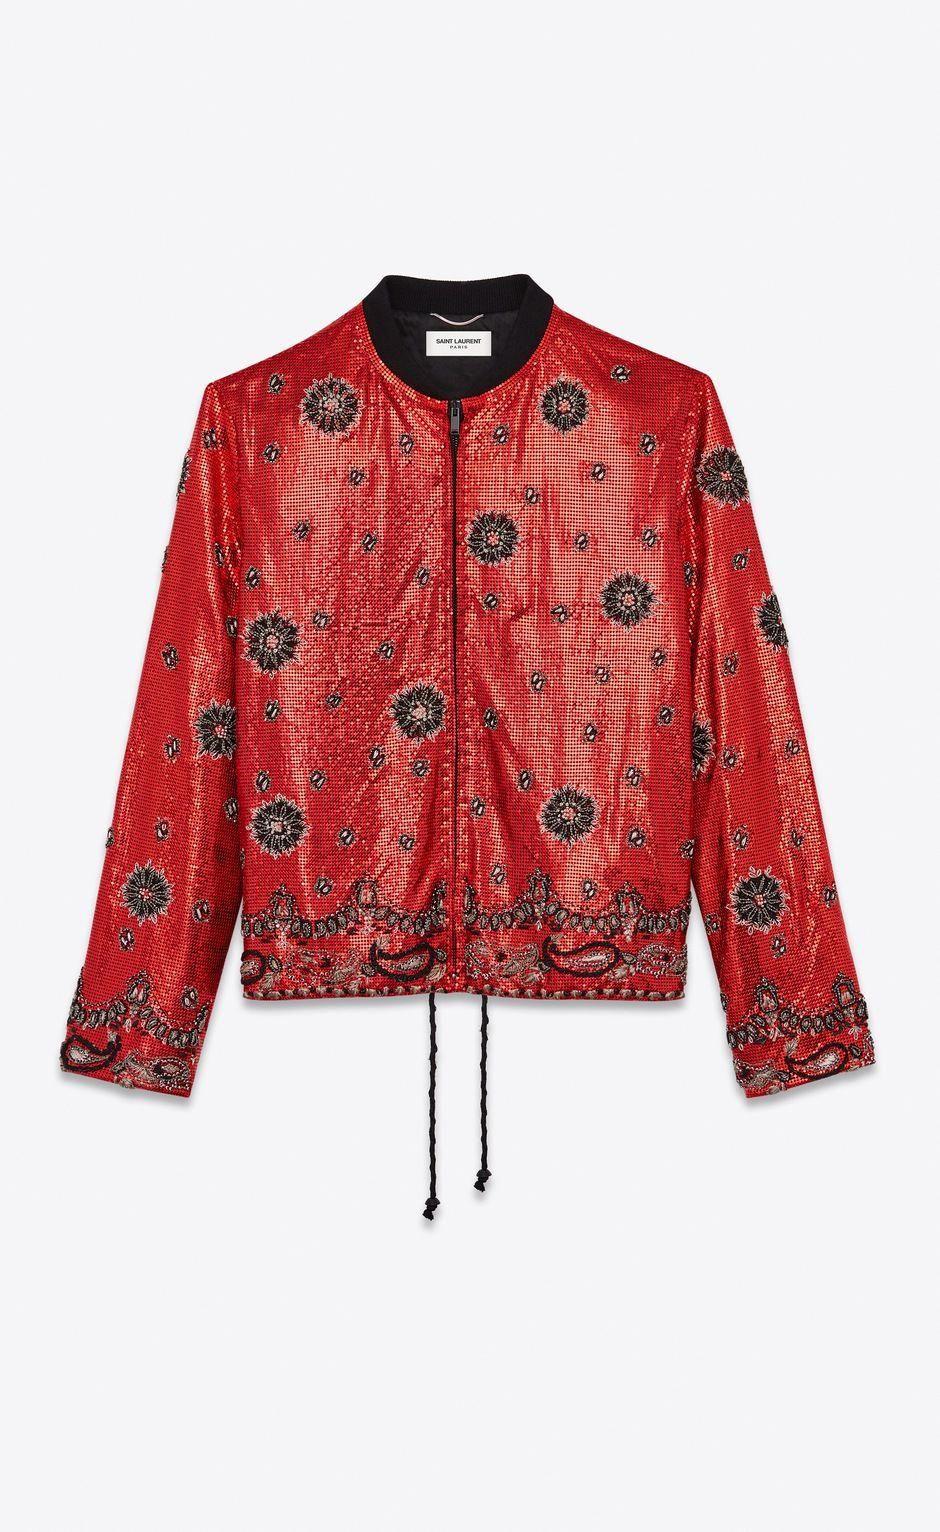 Mesh Varsity Jacket With Bandana Embroidery Front View Leatherjacketsformenbrown Varsity Jacket Women Jackets Gucci Leather Jacket [ 1532 x 940 Pixel ]